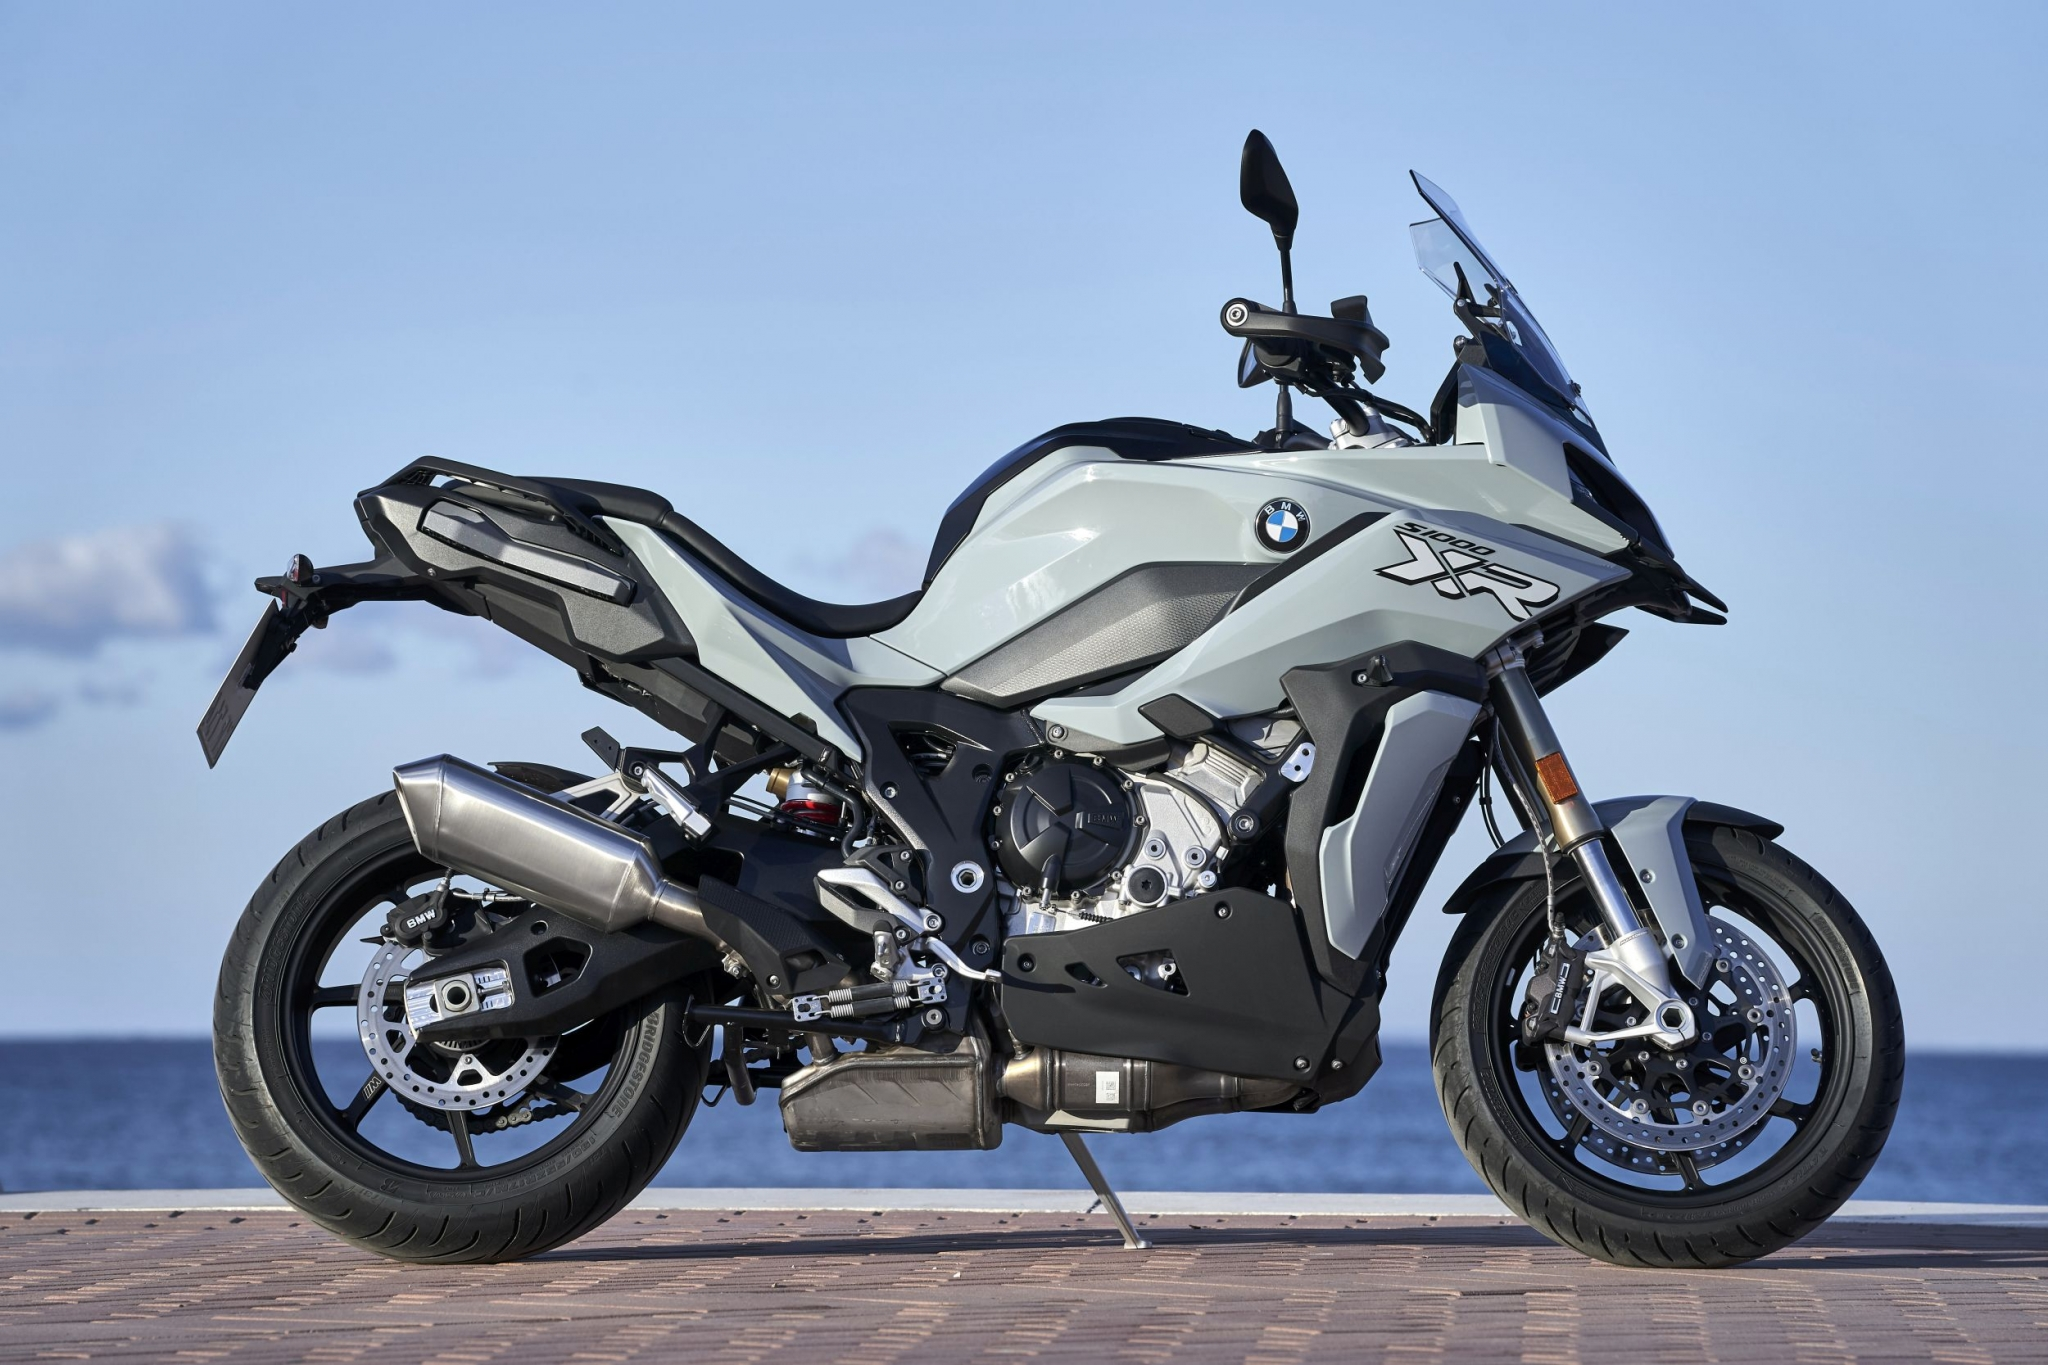 Fahrbericht BMW S 1000 XR 2020 | Westbiker´s Checkpoint